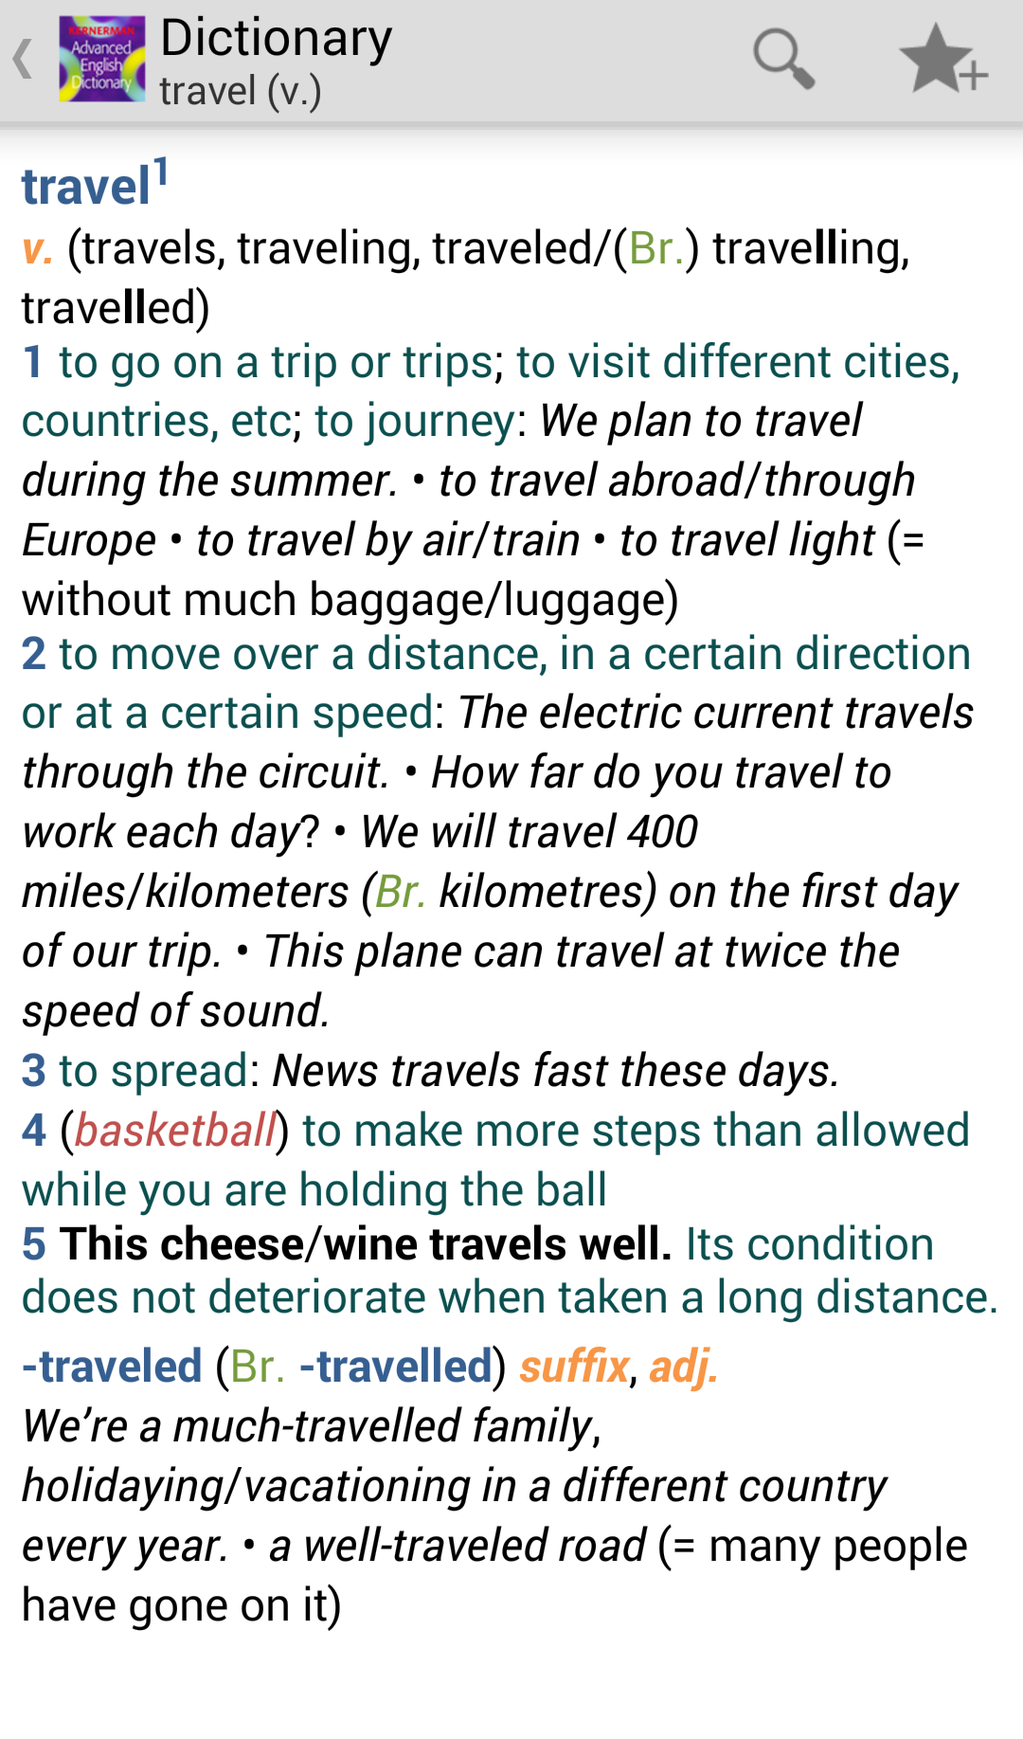 Kernerman Advanced English Dictionary Screenshot 2